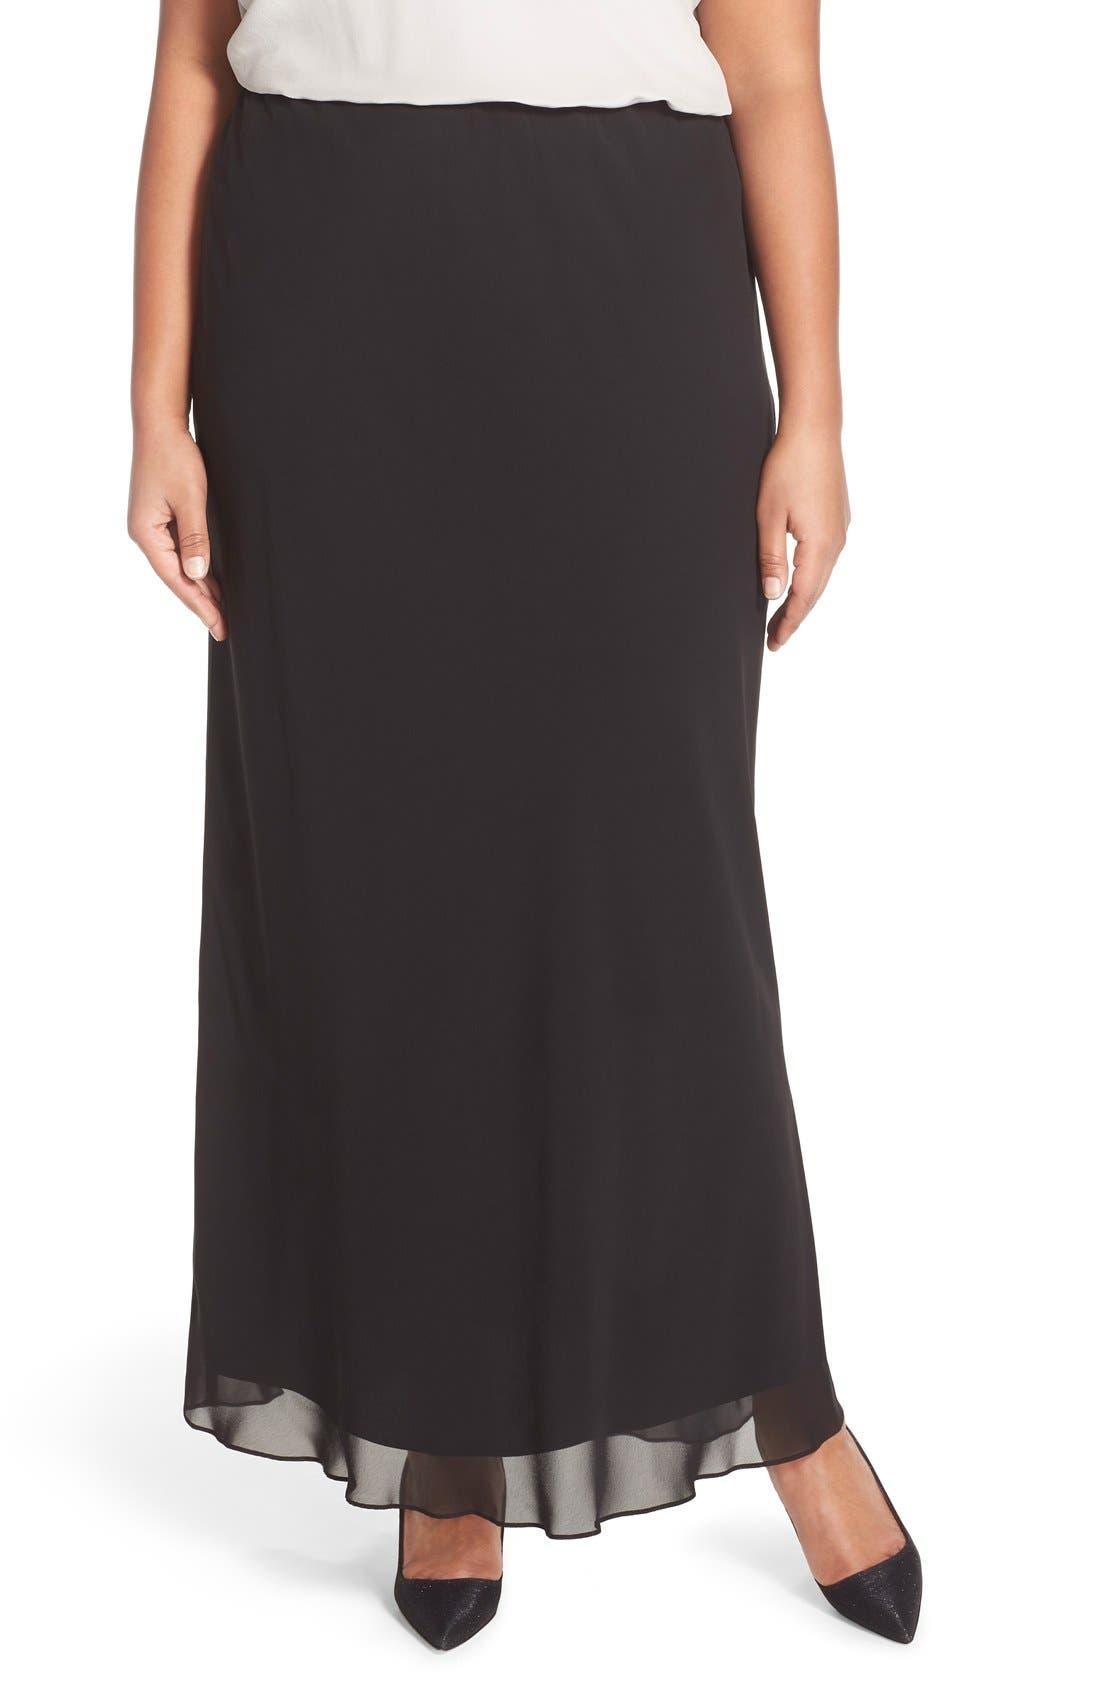 Victorian Skirts | Bustle, Walking, Edwardian Skirts Plus Size Womens Alex Evenings Chiffon Maxi Skirt $47.40 AT vintagedancer.com